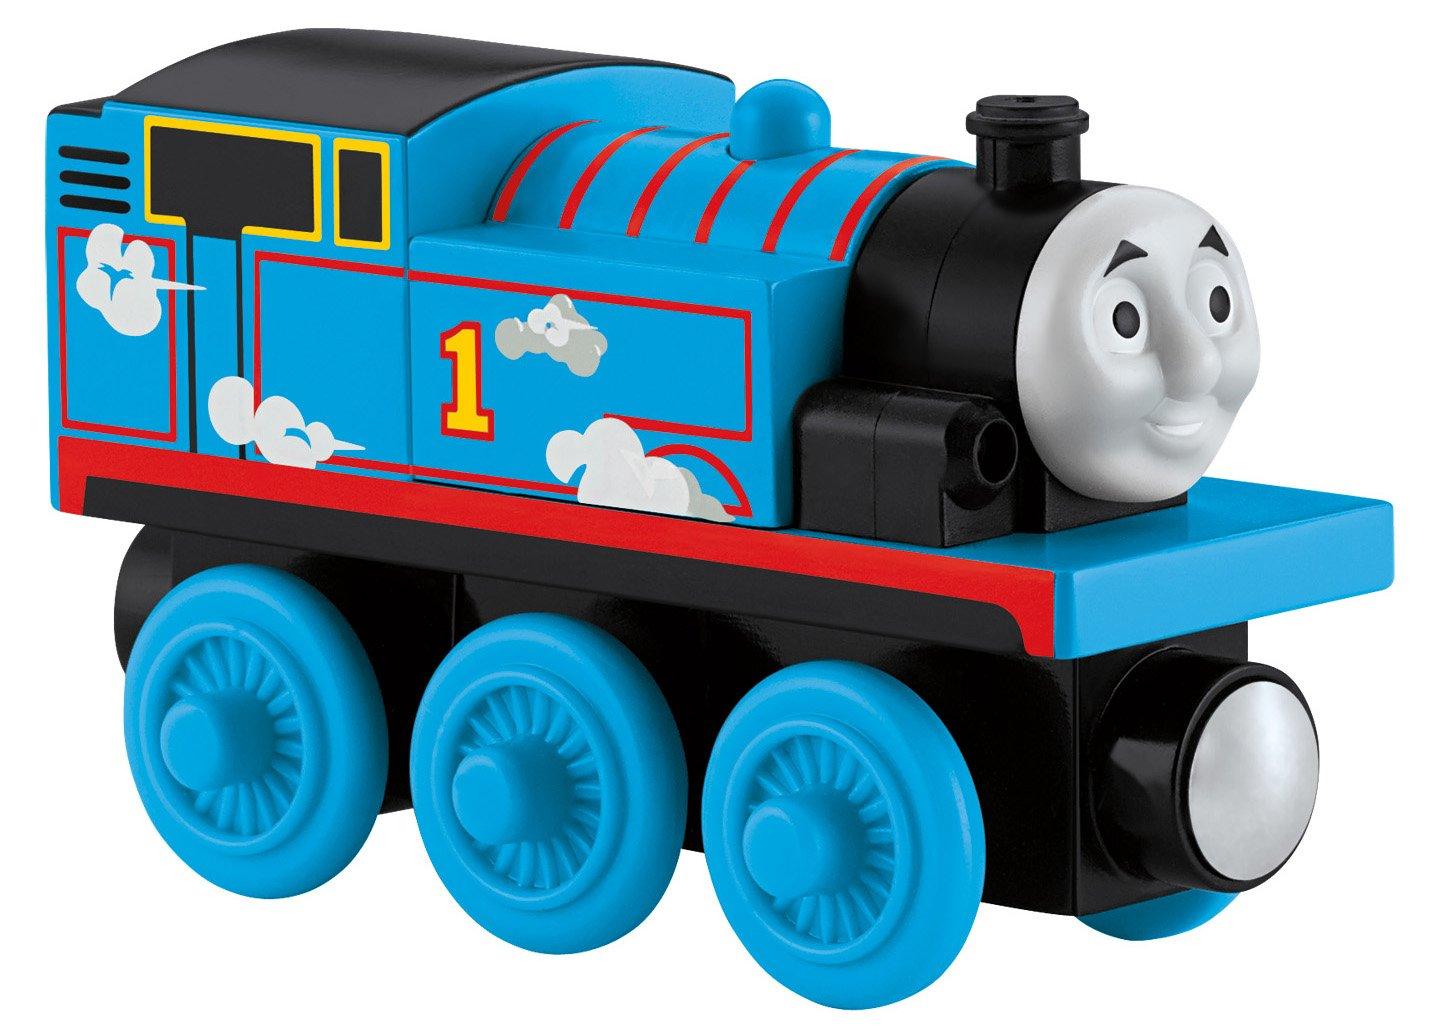 Thomas & Friends Fisher-Price Wooden Railway, Roll & Whistle Thomas